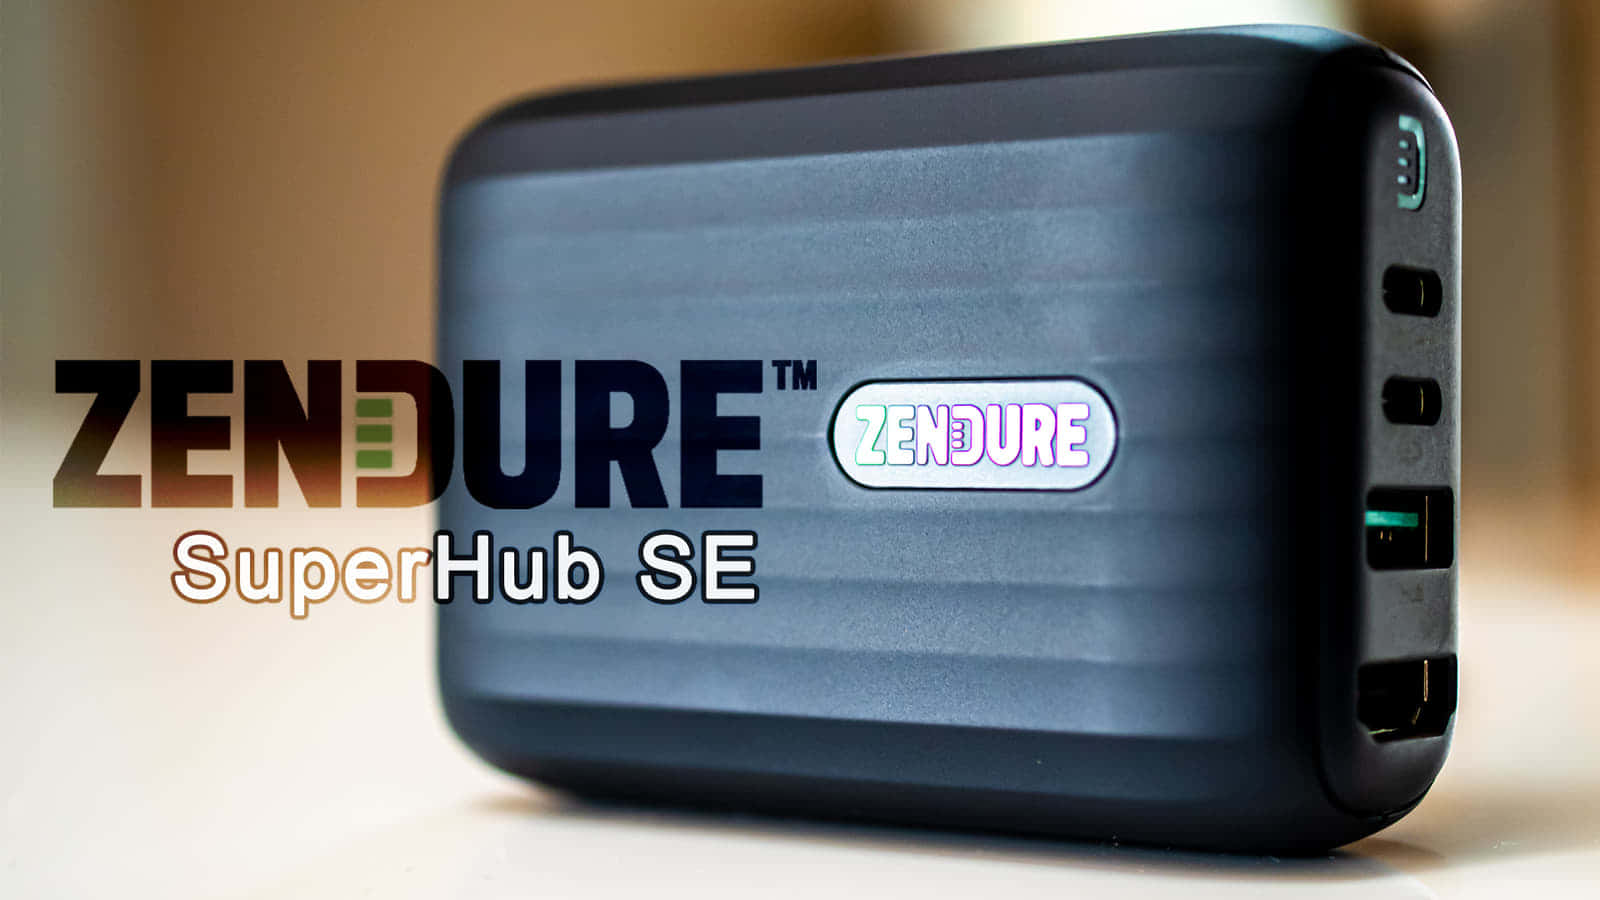 「Zendure SuperHub SE」新時代のHDMI搭載USBドック、ポケットサイズのゲーム・ビジネスデバイス